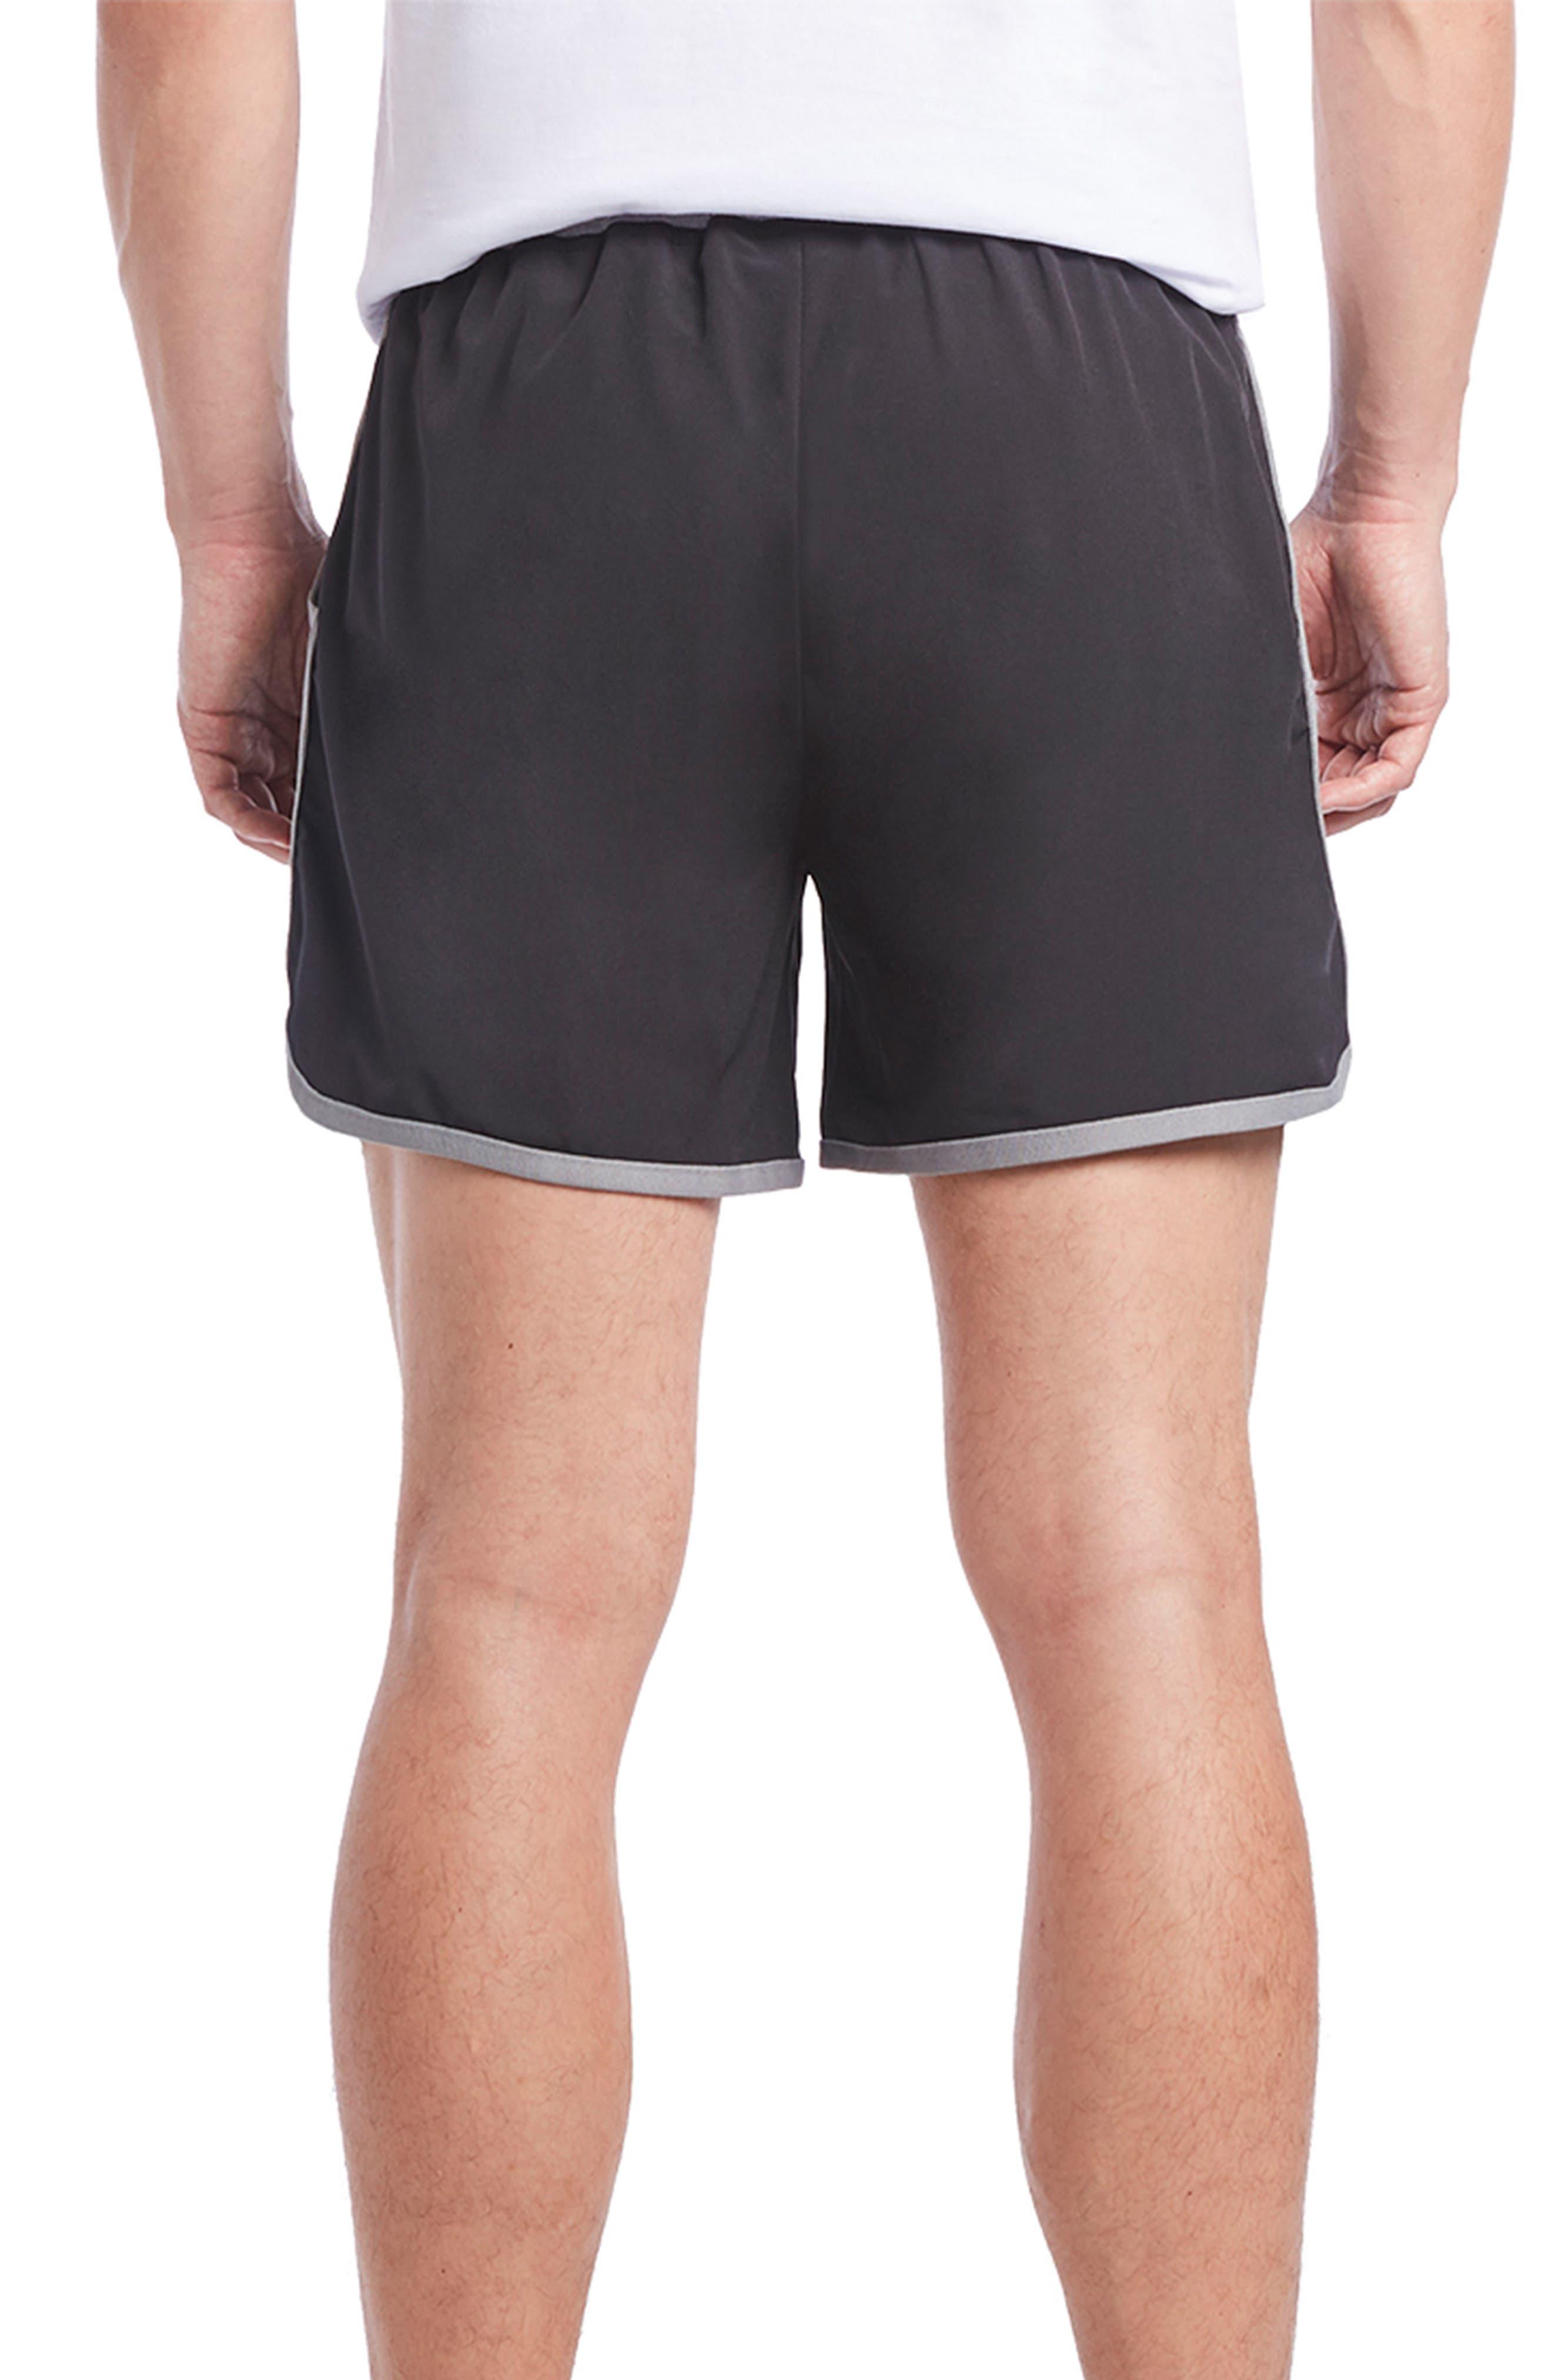 Performance Jogger Shorts,                             Alternate thumbnail 2, color,                             BLACK/ EARL GREY